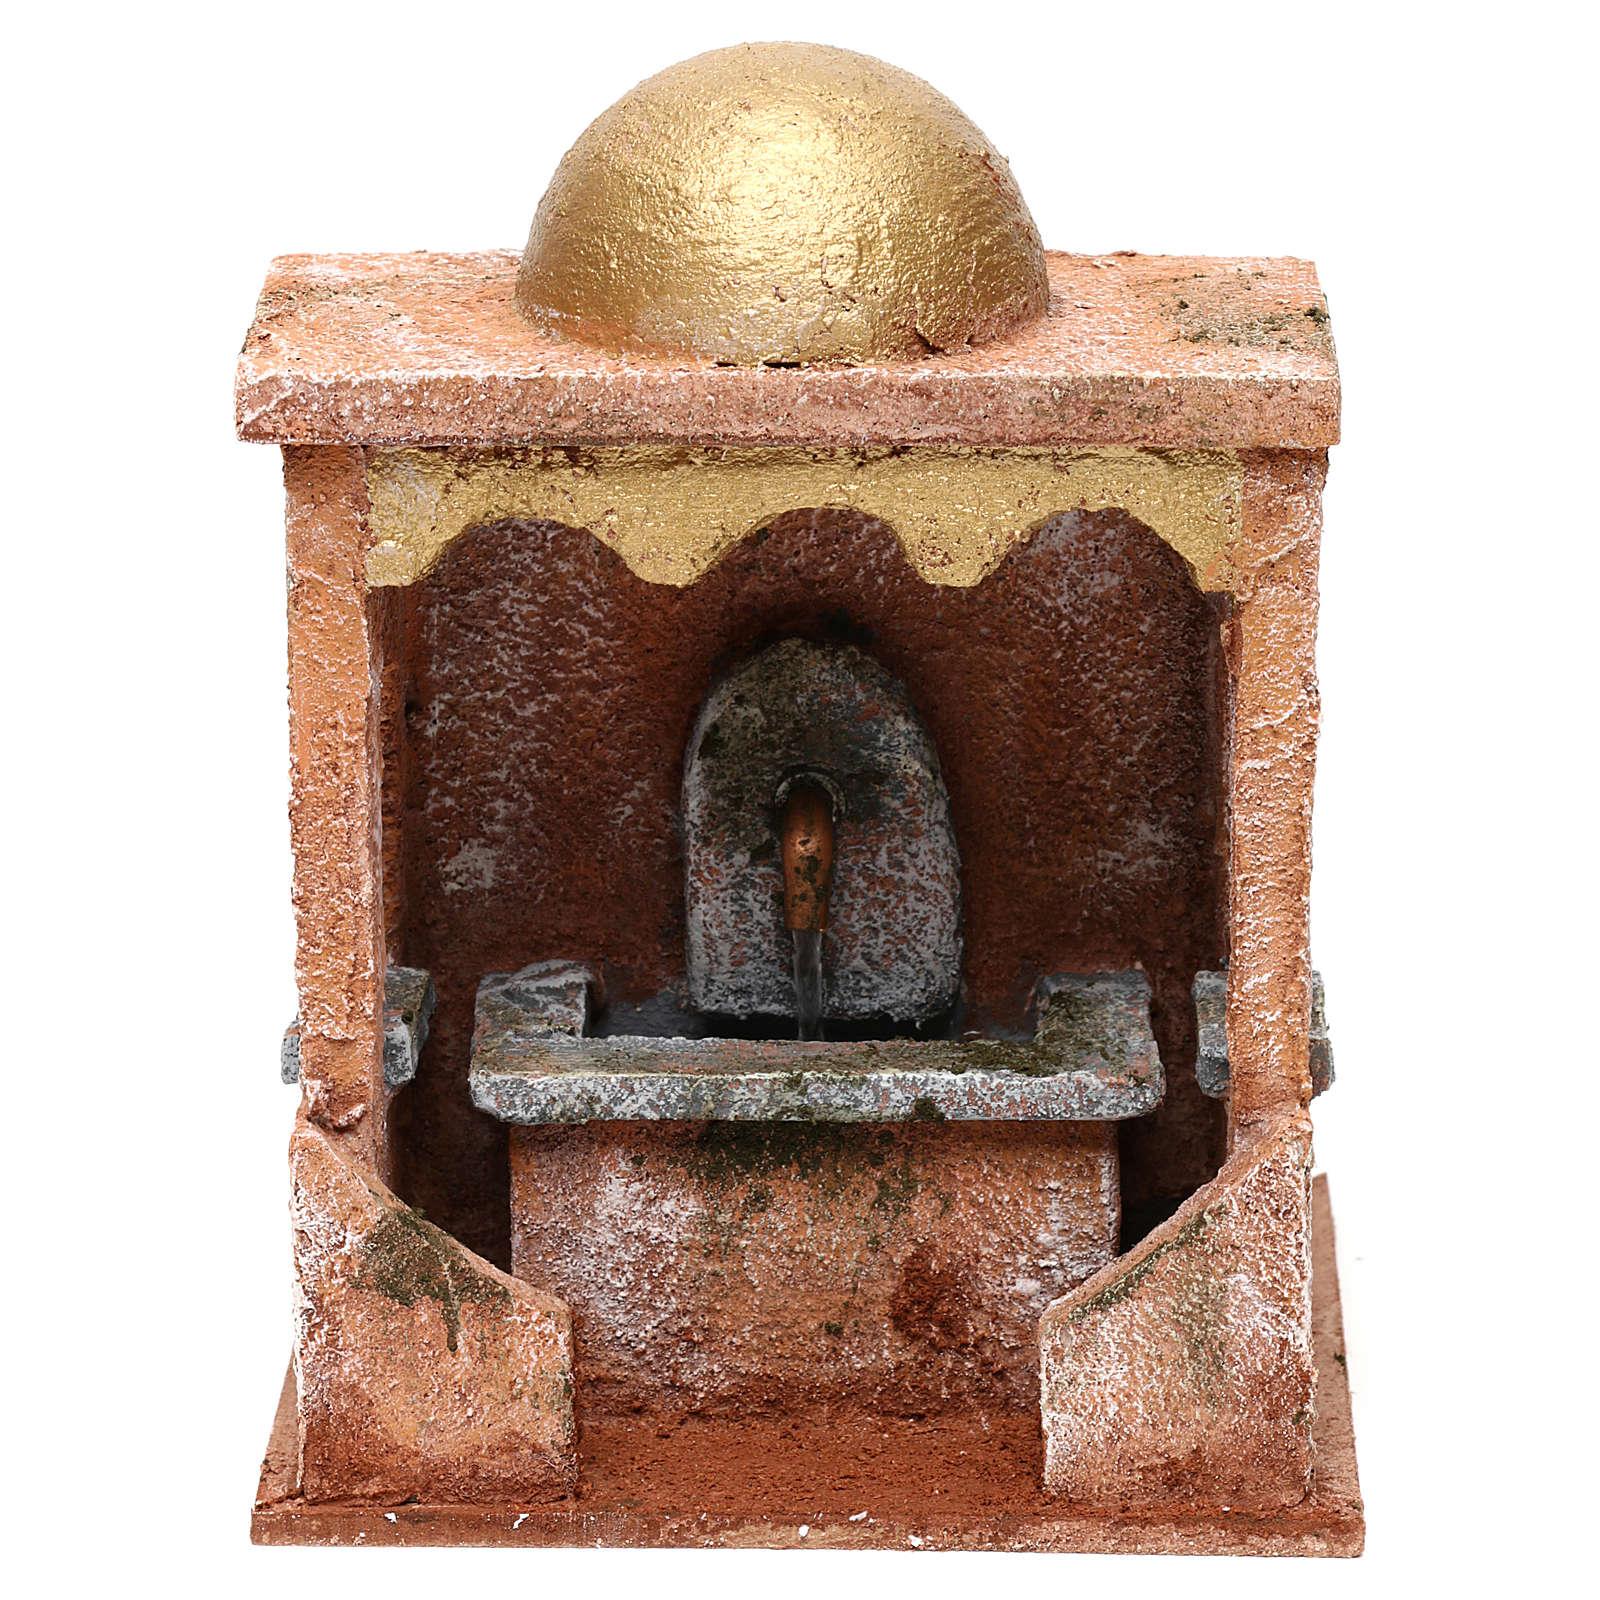 Electric fountain for Nativity scene 20x15x15 cm 4